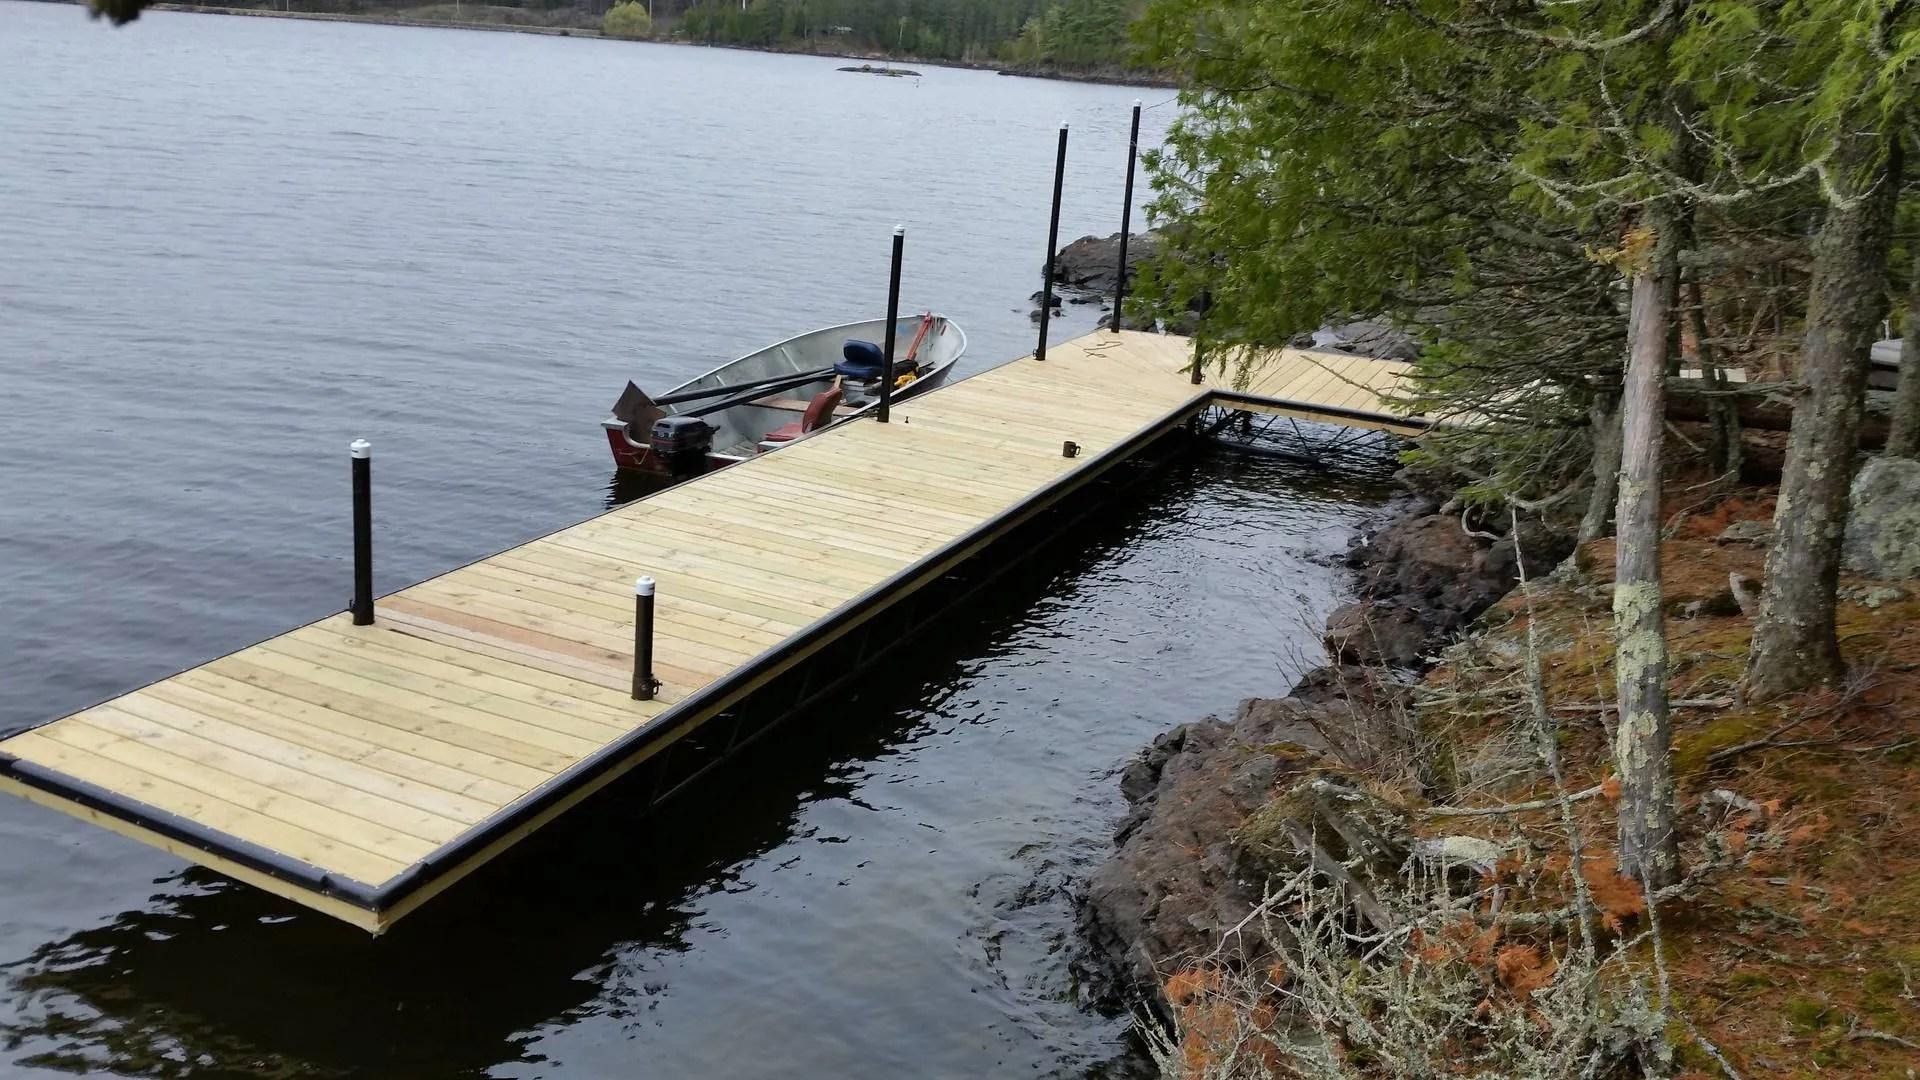 Docks On Wheels